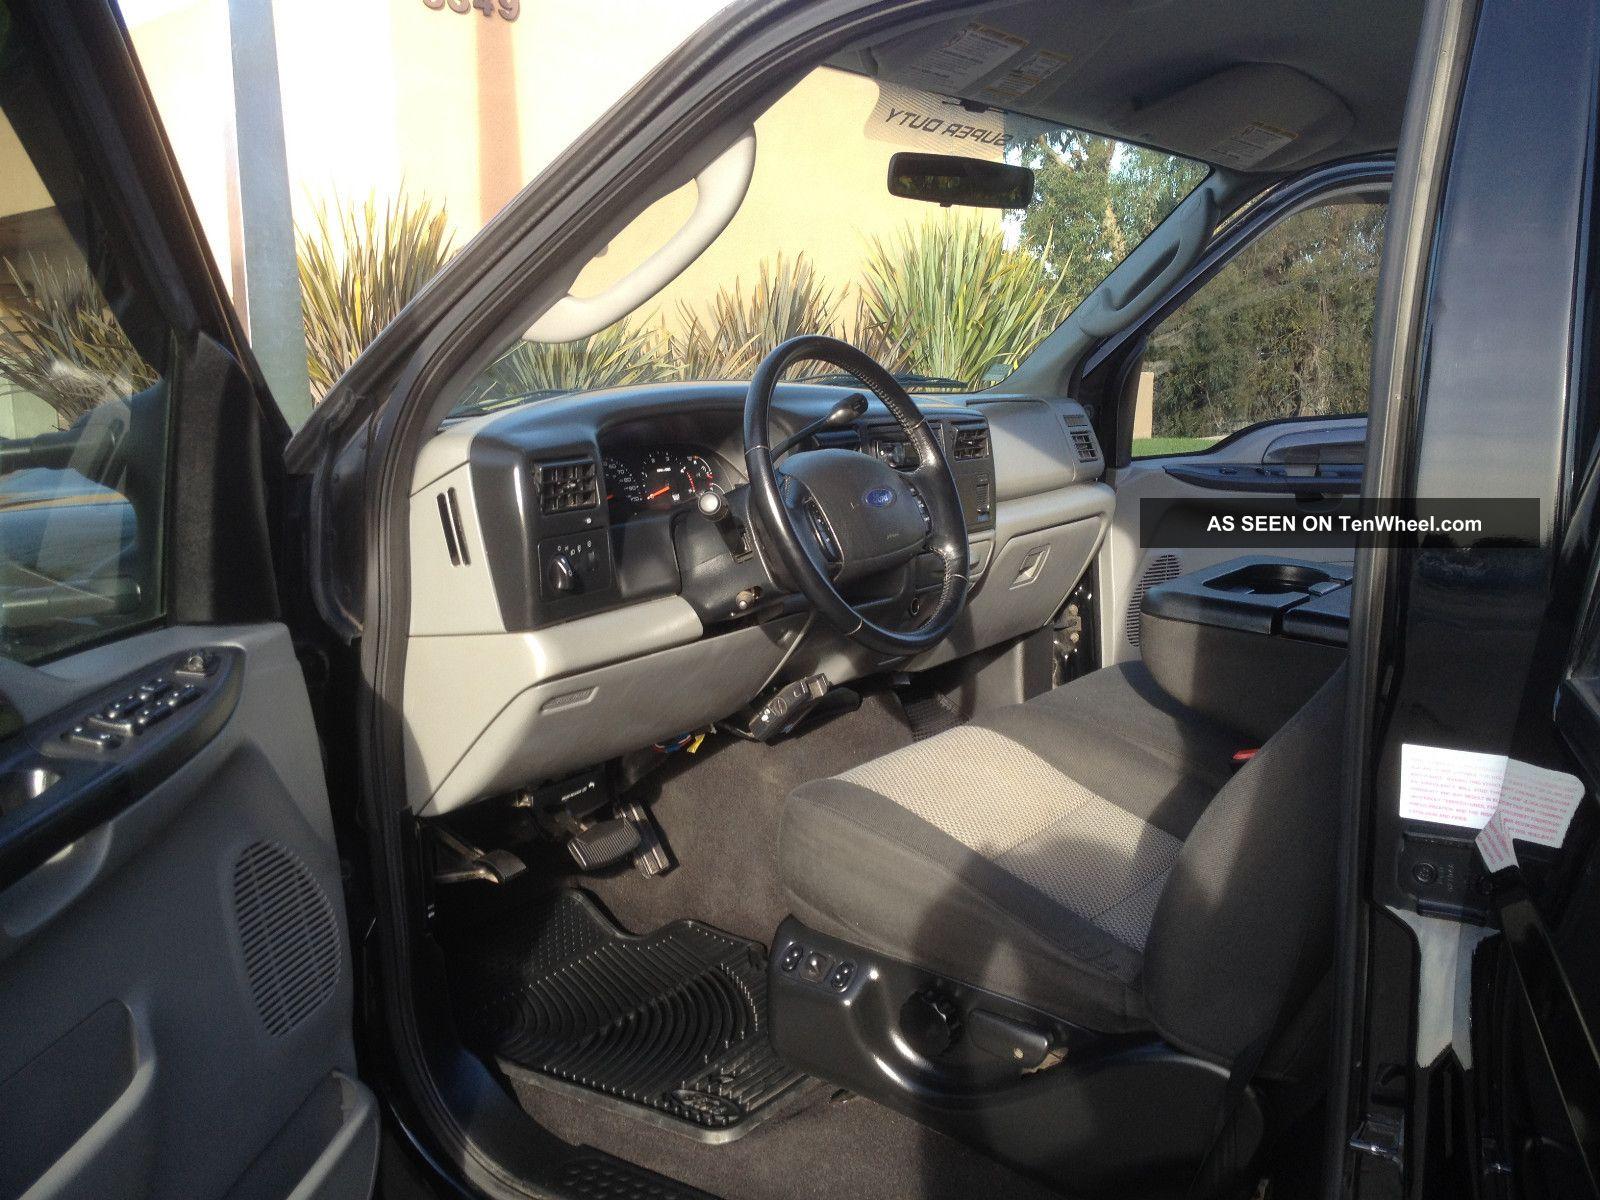 2004 Ford F 250 Fx4 Black F250 Truck Duty Crew Cab 4 Door Remote Start 150 Fx